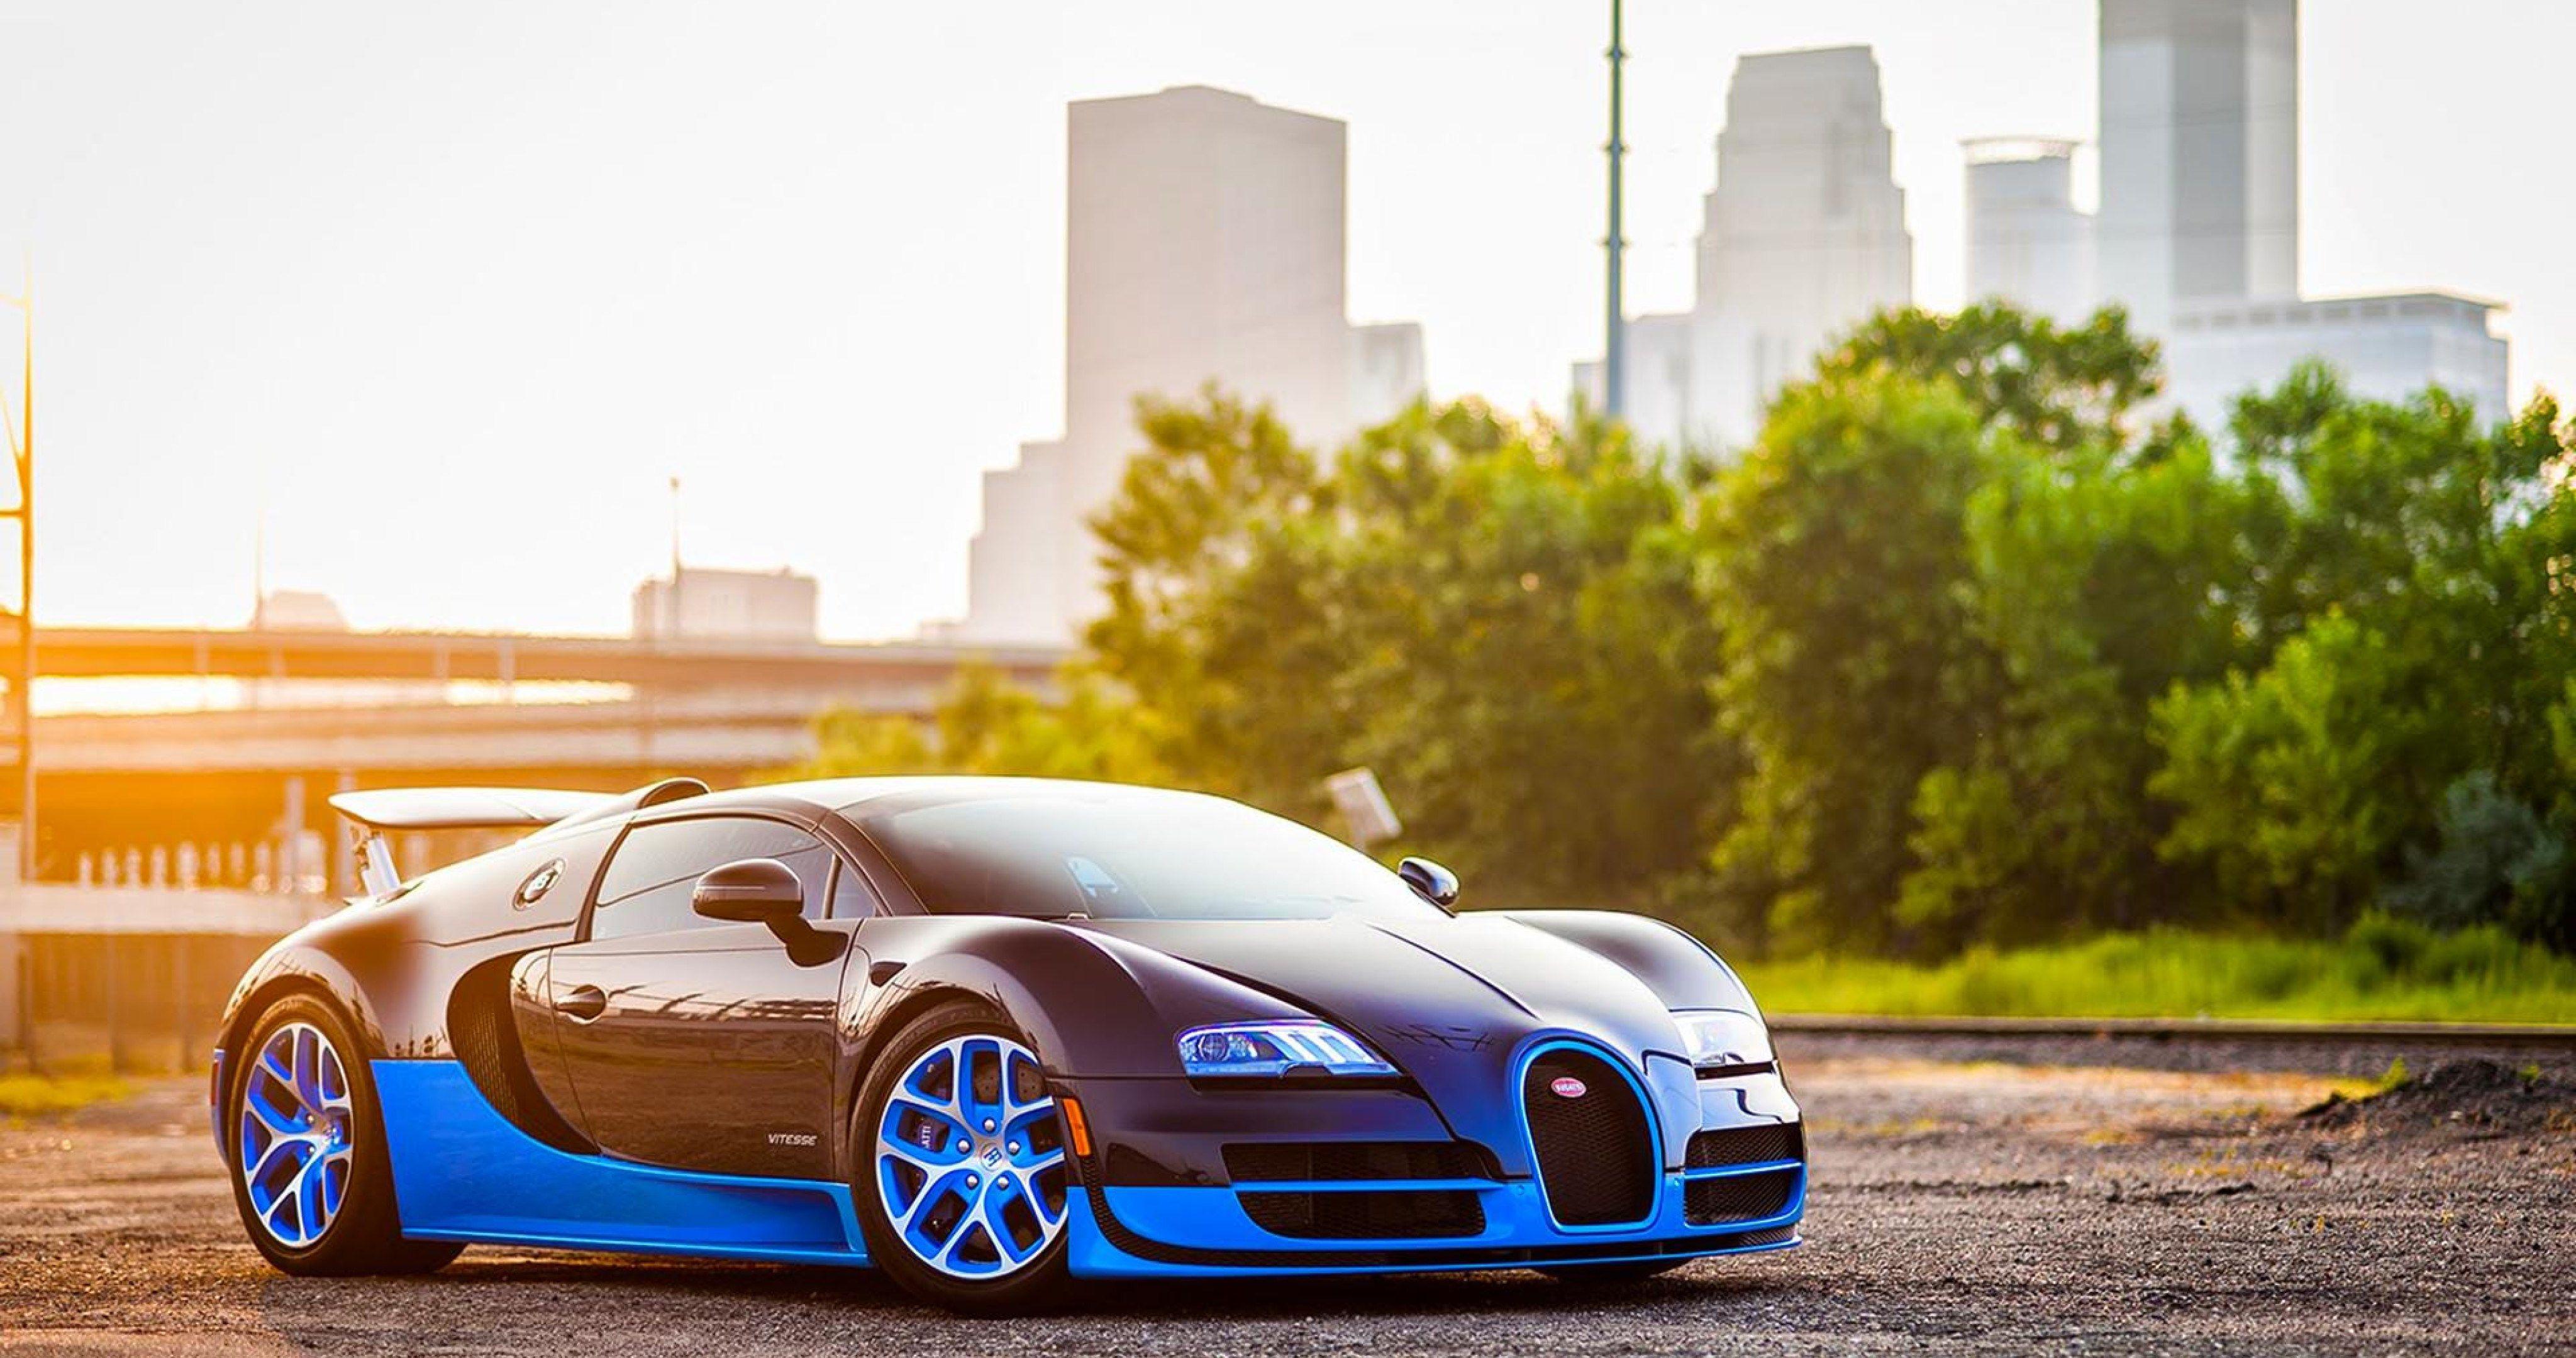 0d3c3663f064e617c3b80a05b2b896eb Interesting Bugatti Veyron Grand Sport Vitesse Vs Pagani Huayra Cars Trend